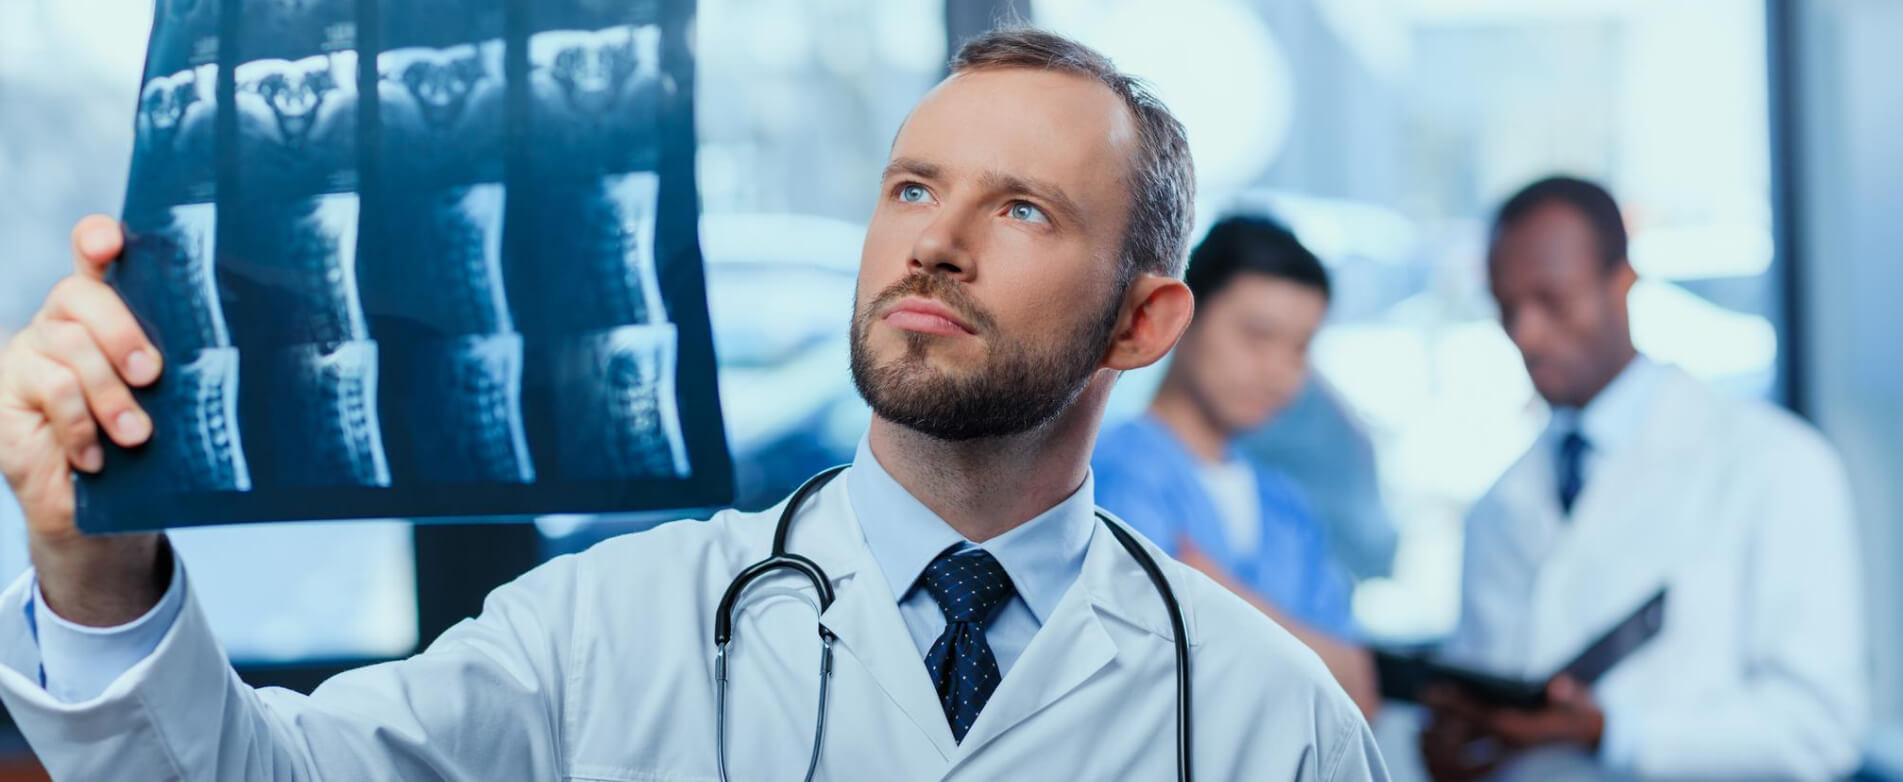 Сайт для медицинского центра: ТОП 20 сайтов медицинской тематики